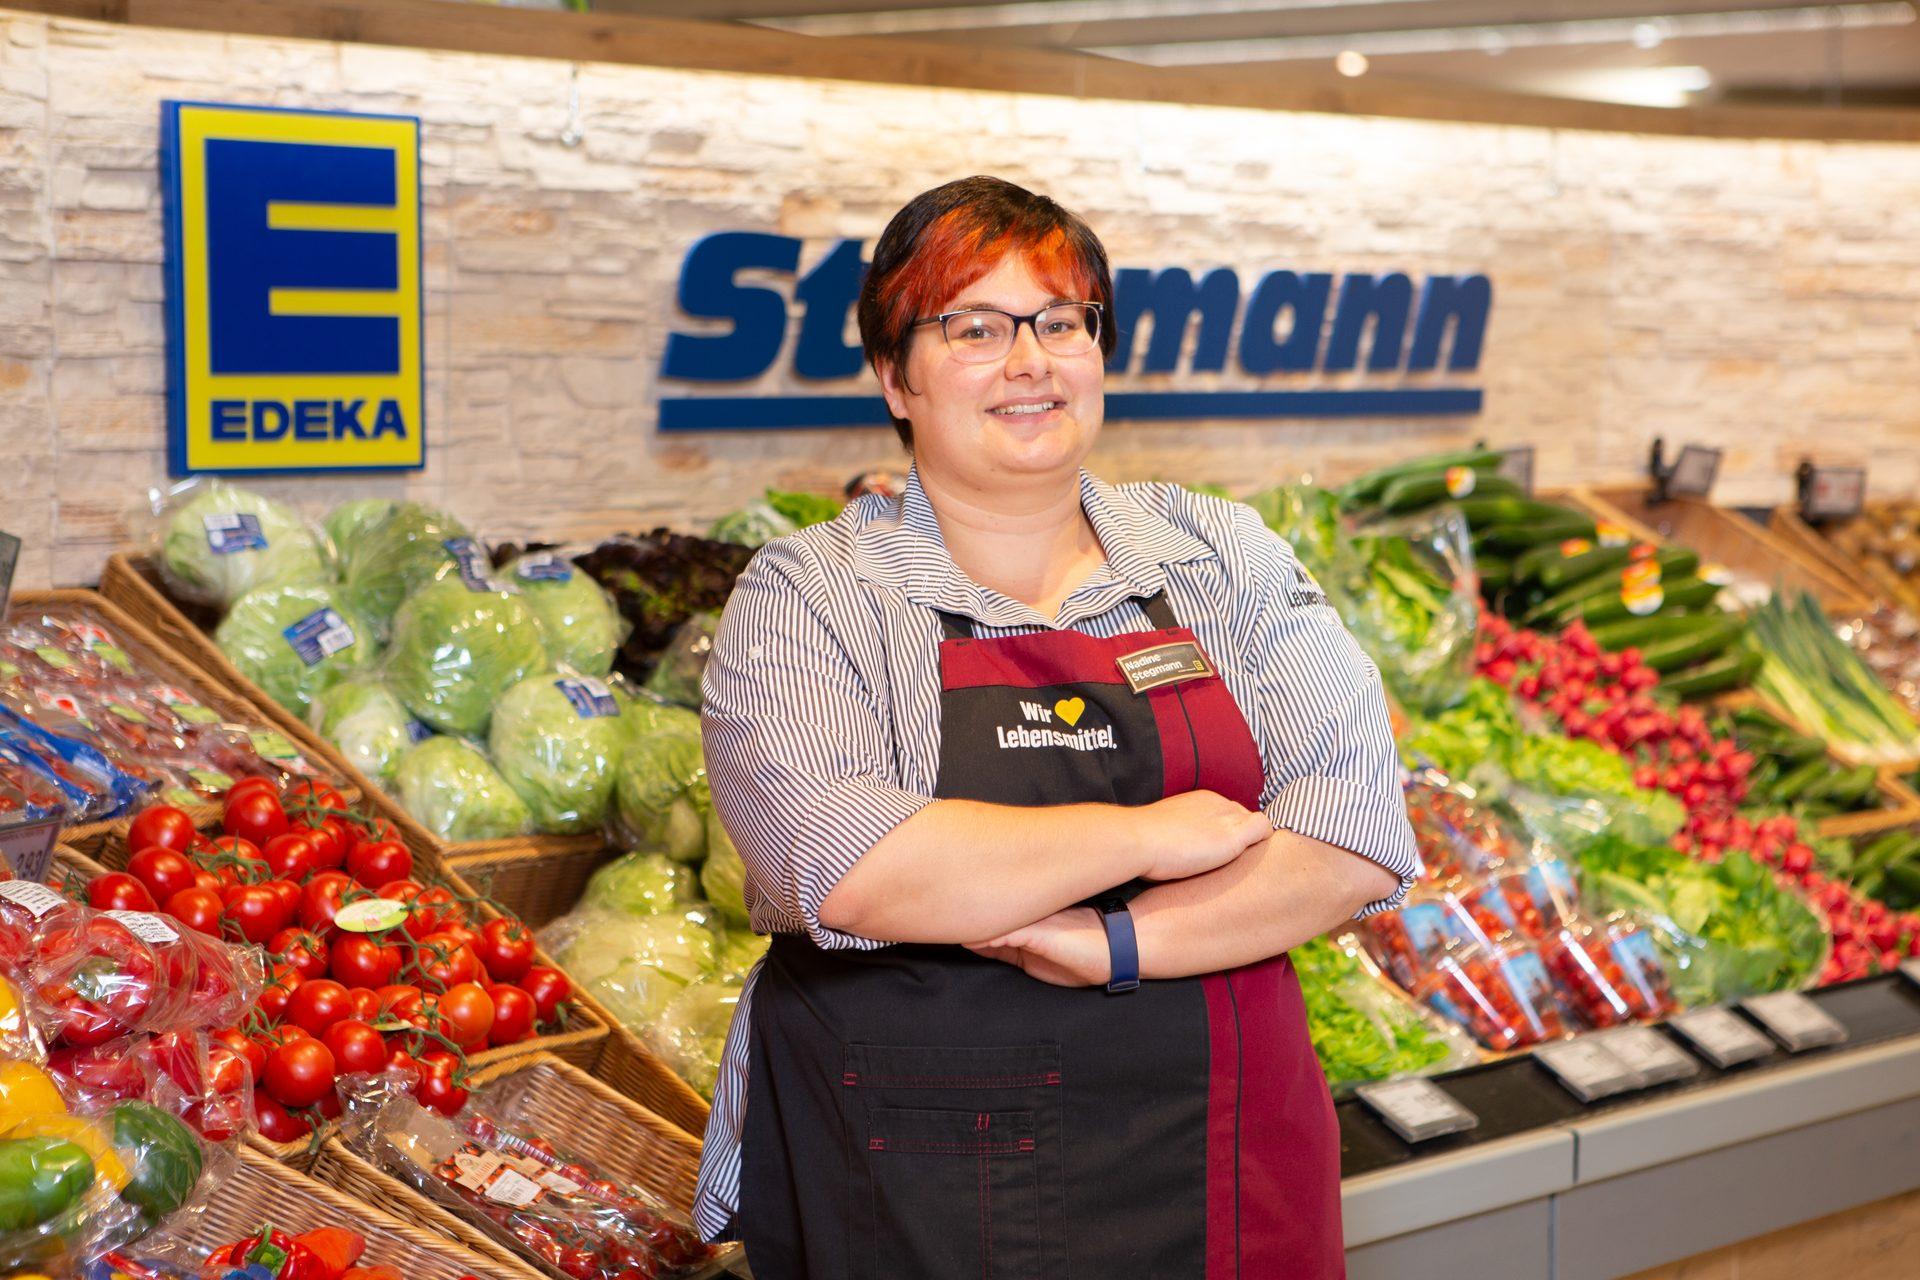 Edeka Stegmann Kissing Nadine Stegmann